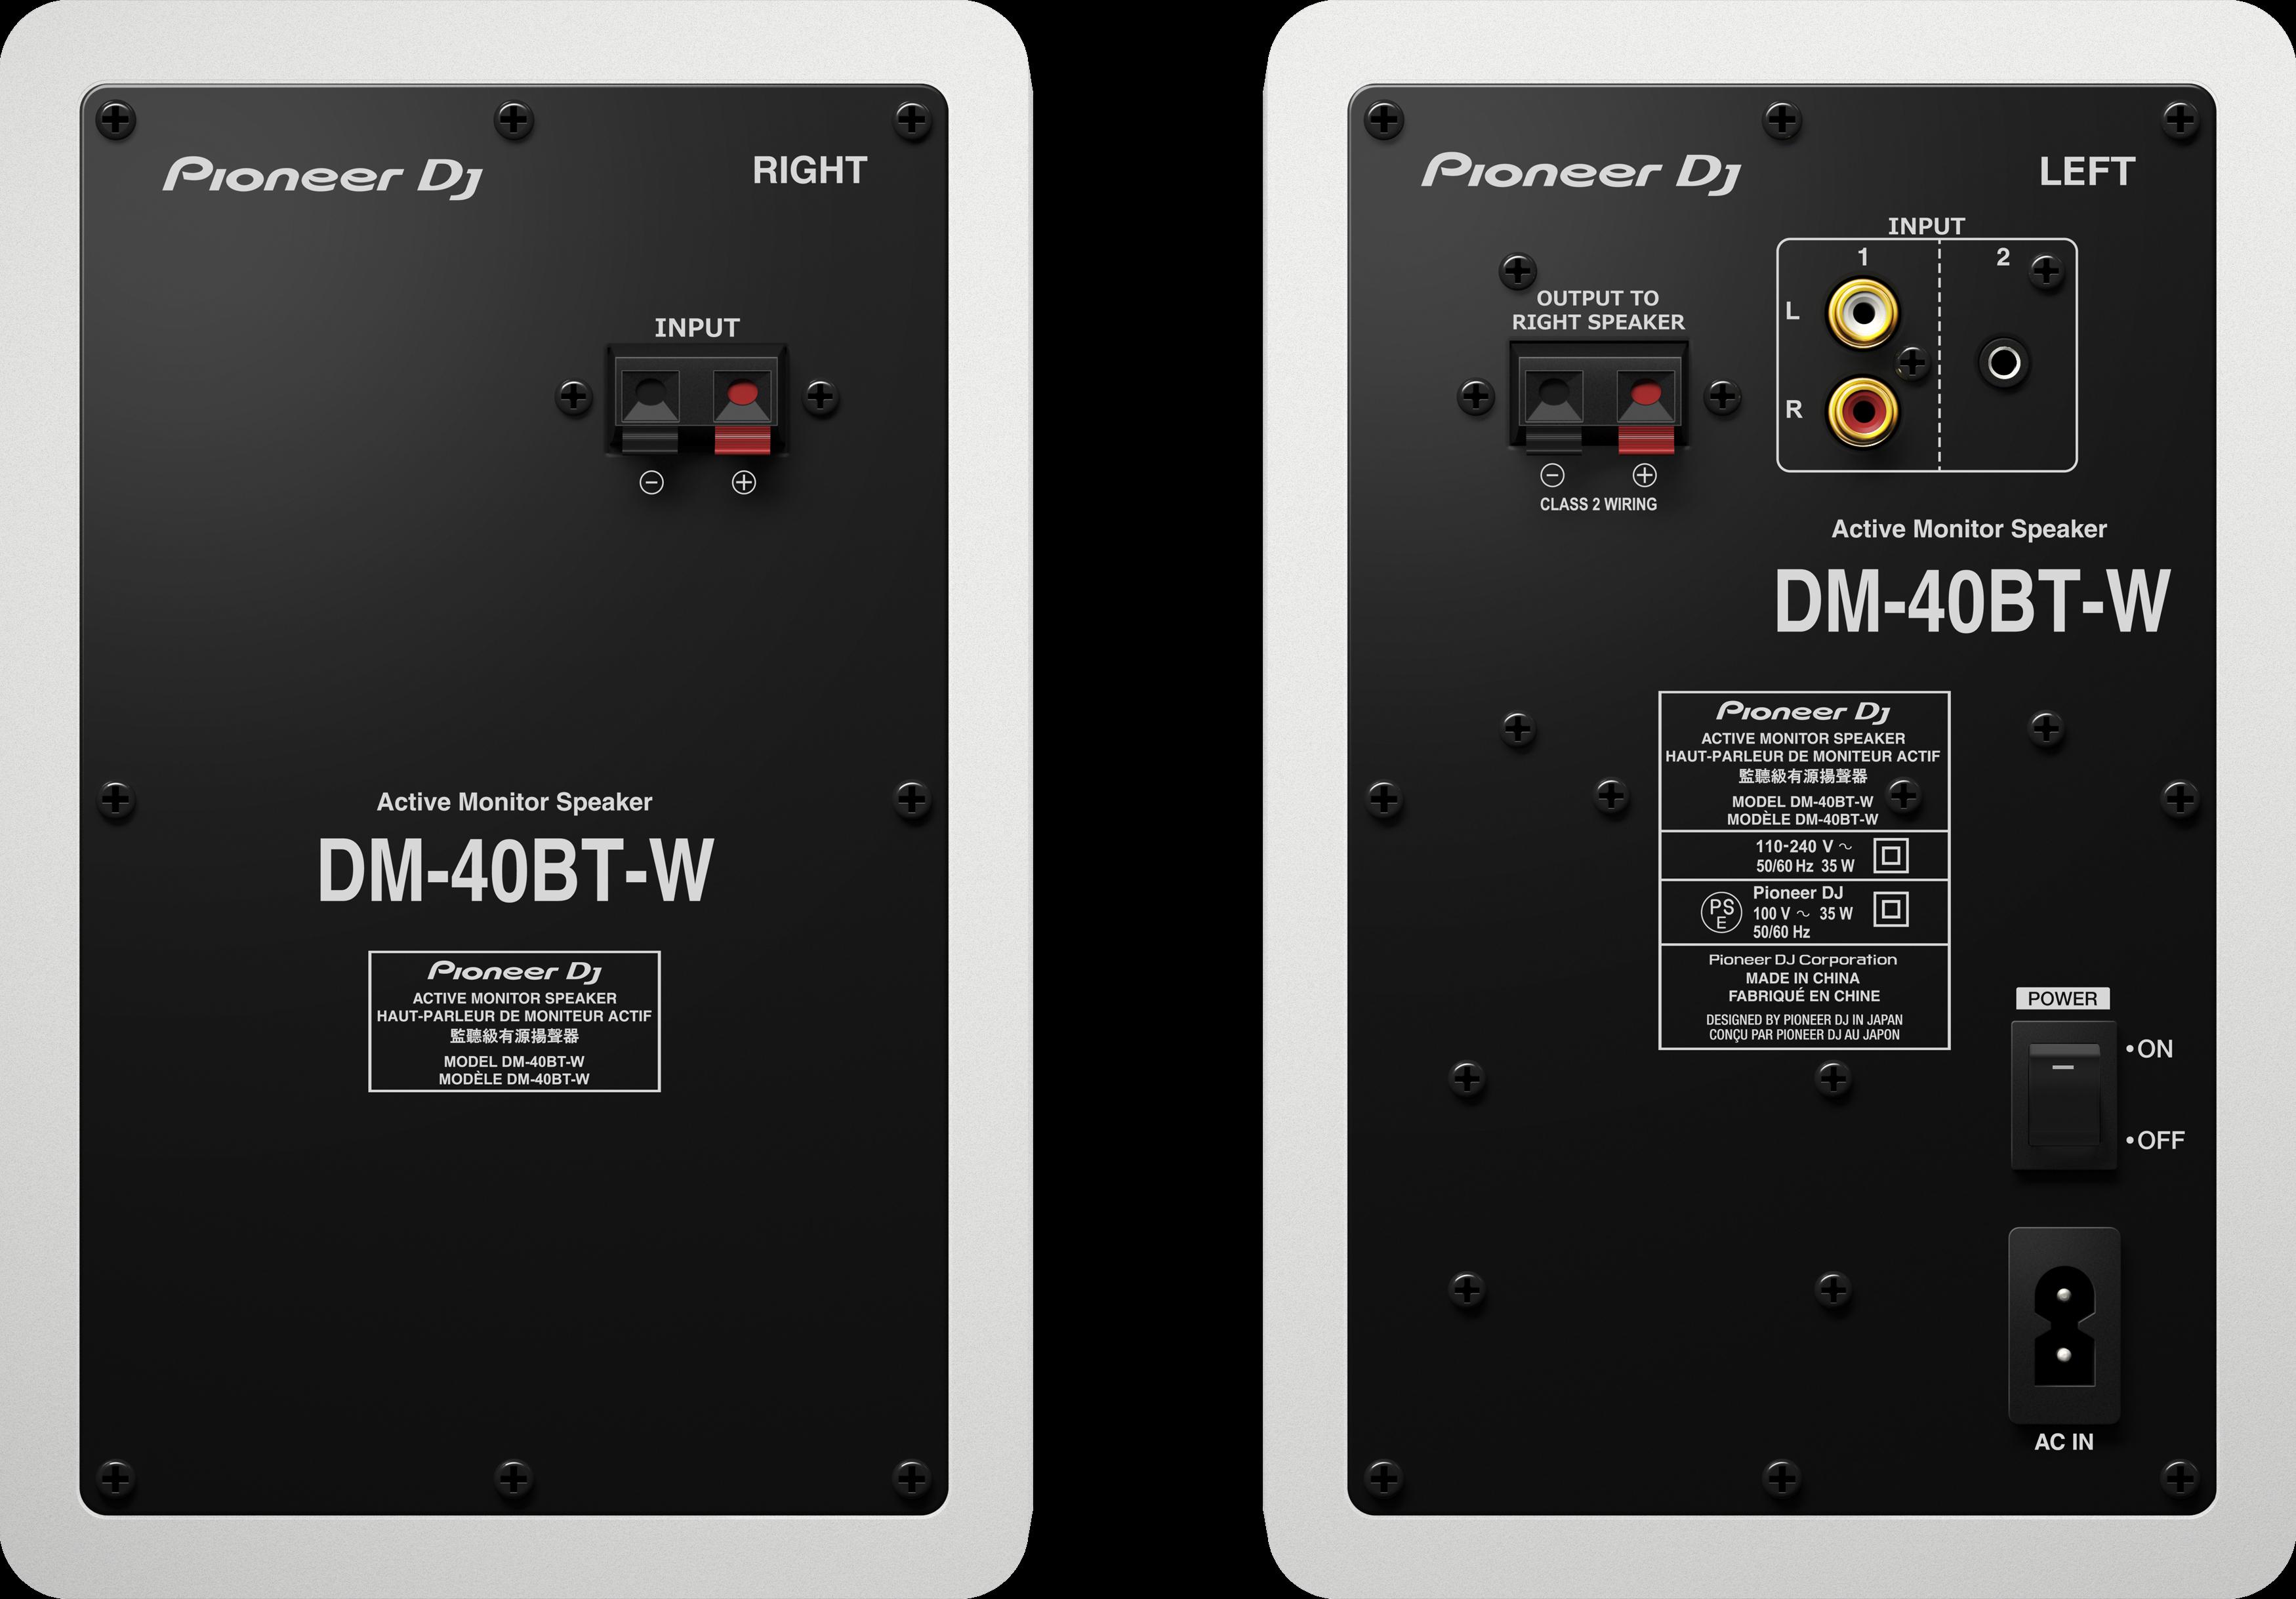 DM-40BT-W